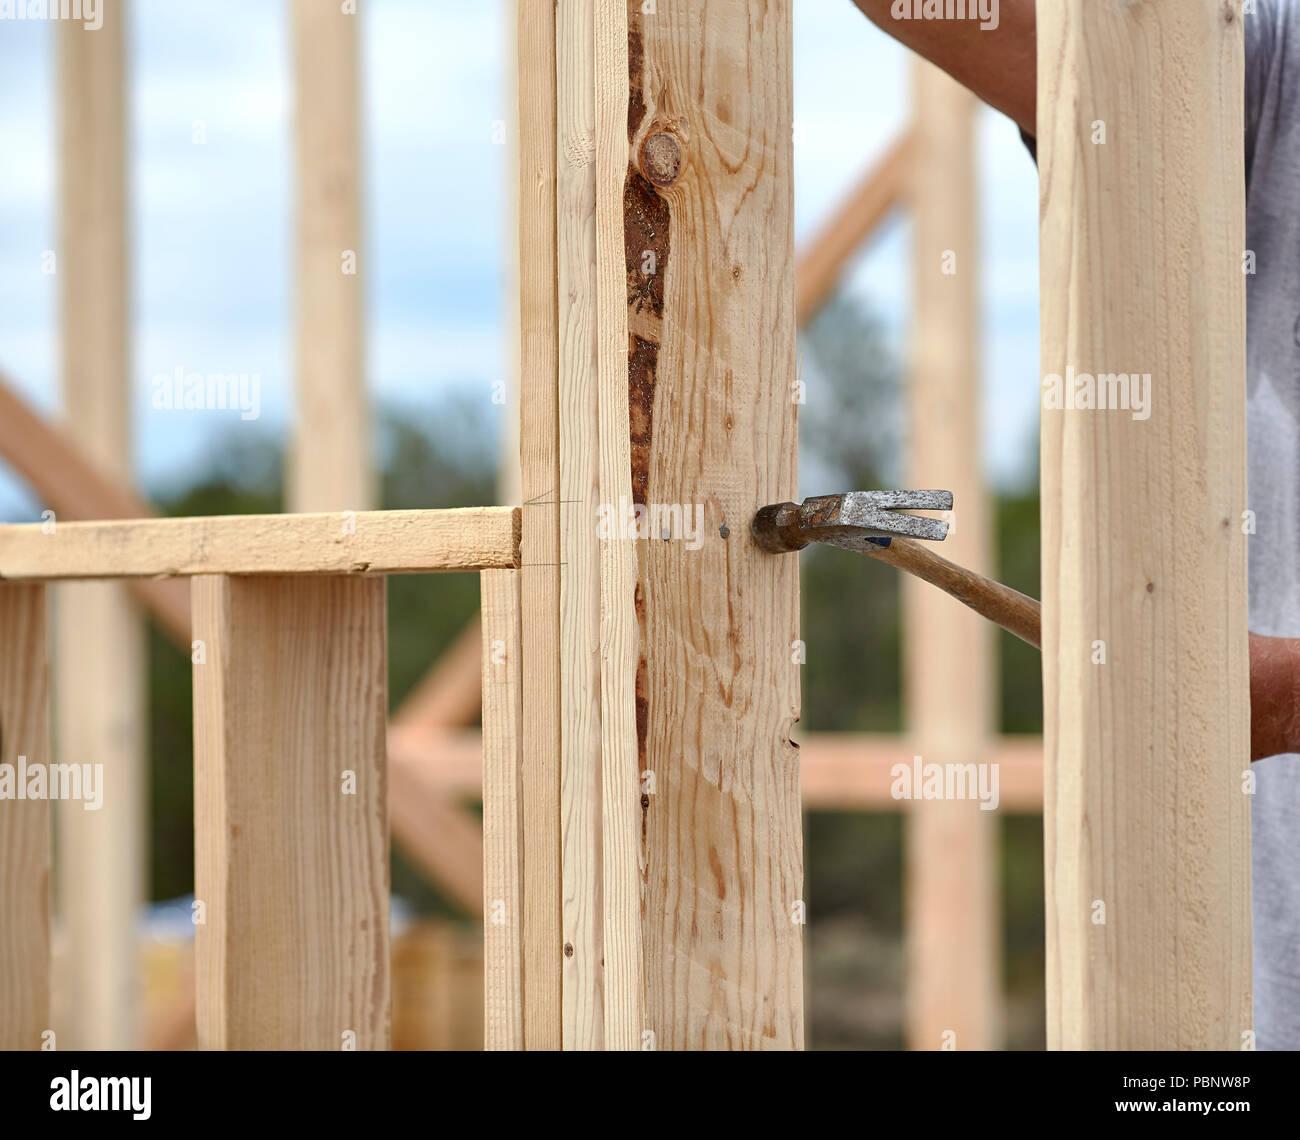 Wall Stud Stockfotos & Wall Stud Bilder - Alamy